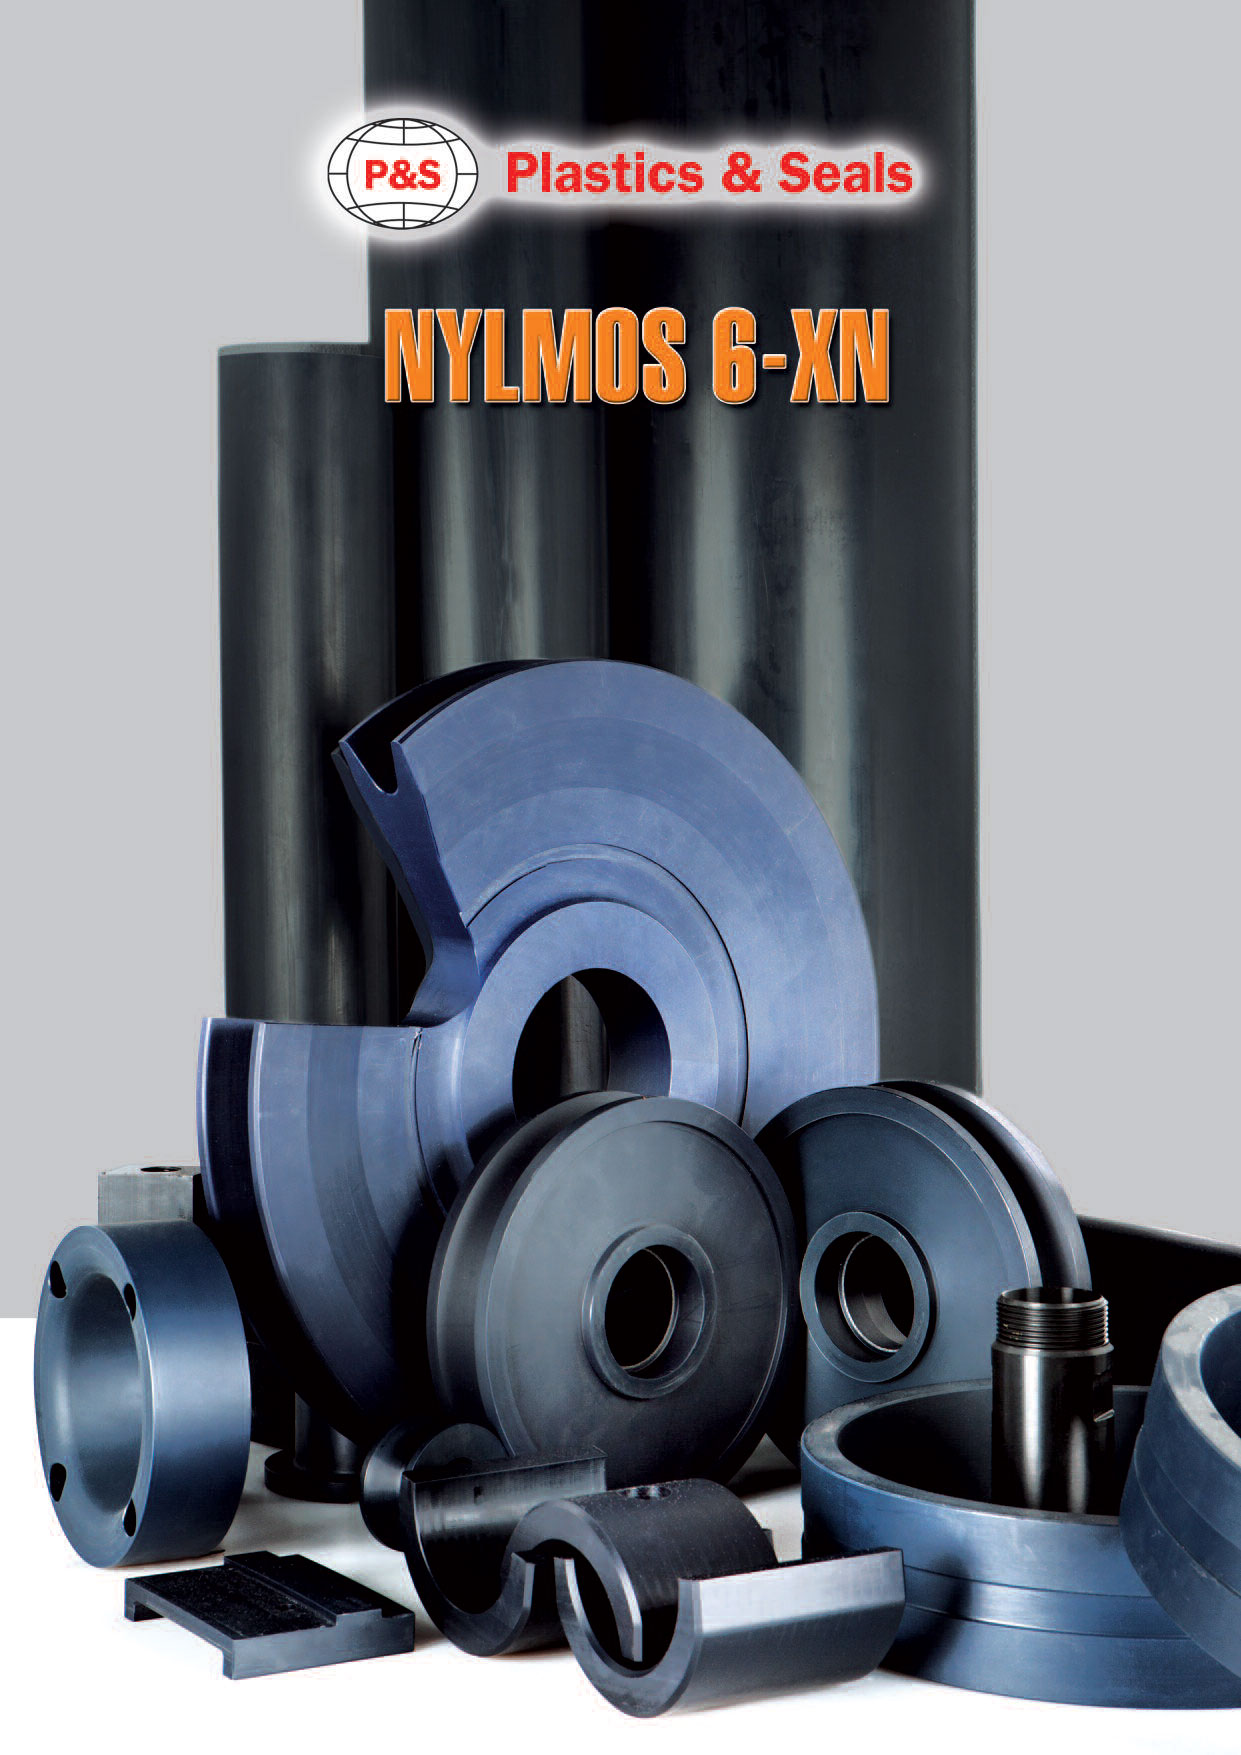 NYLMOS 6XN